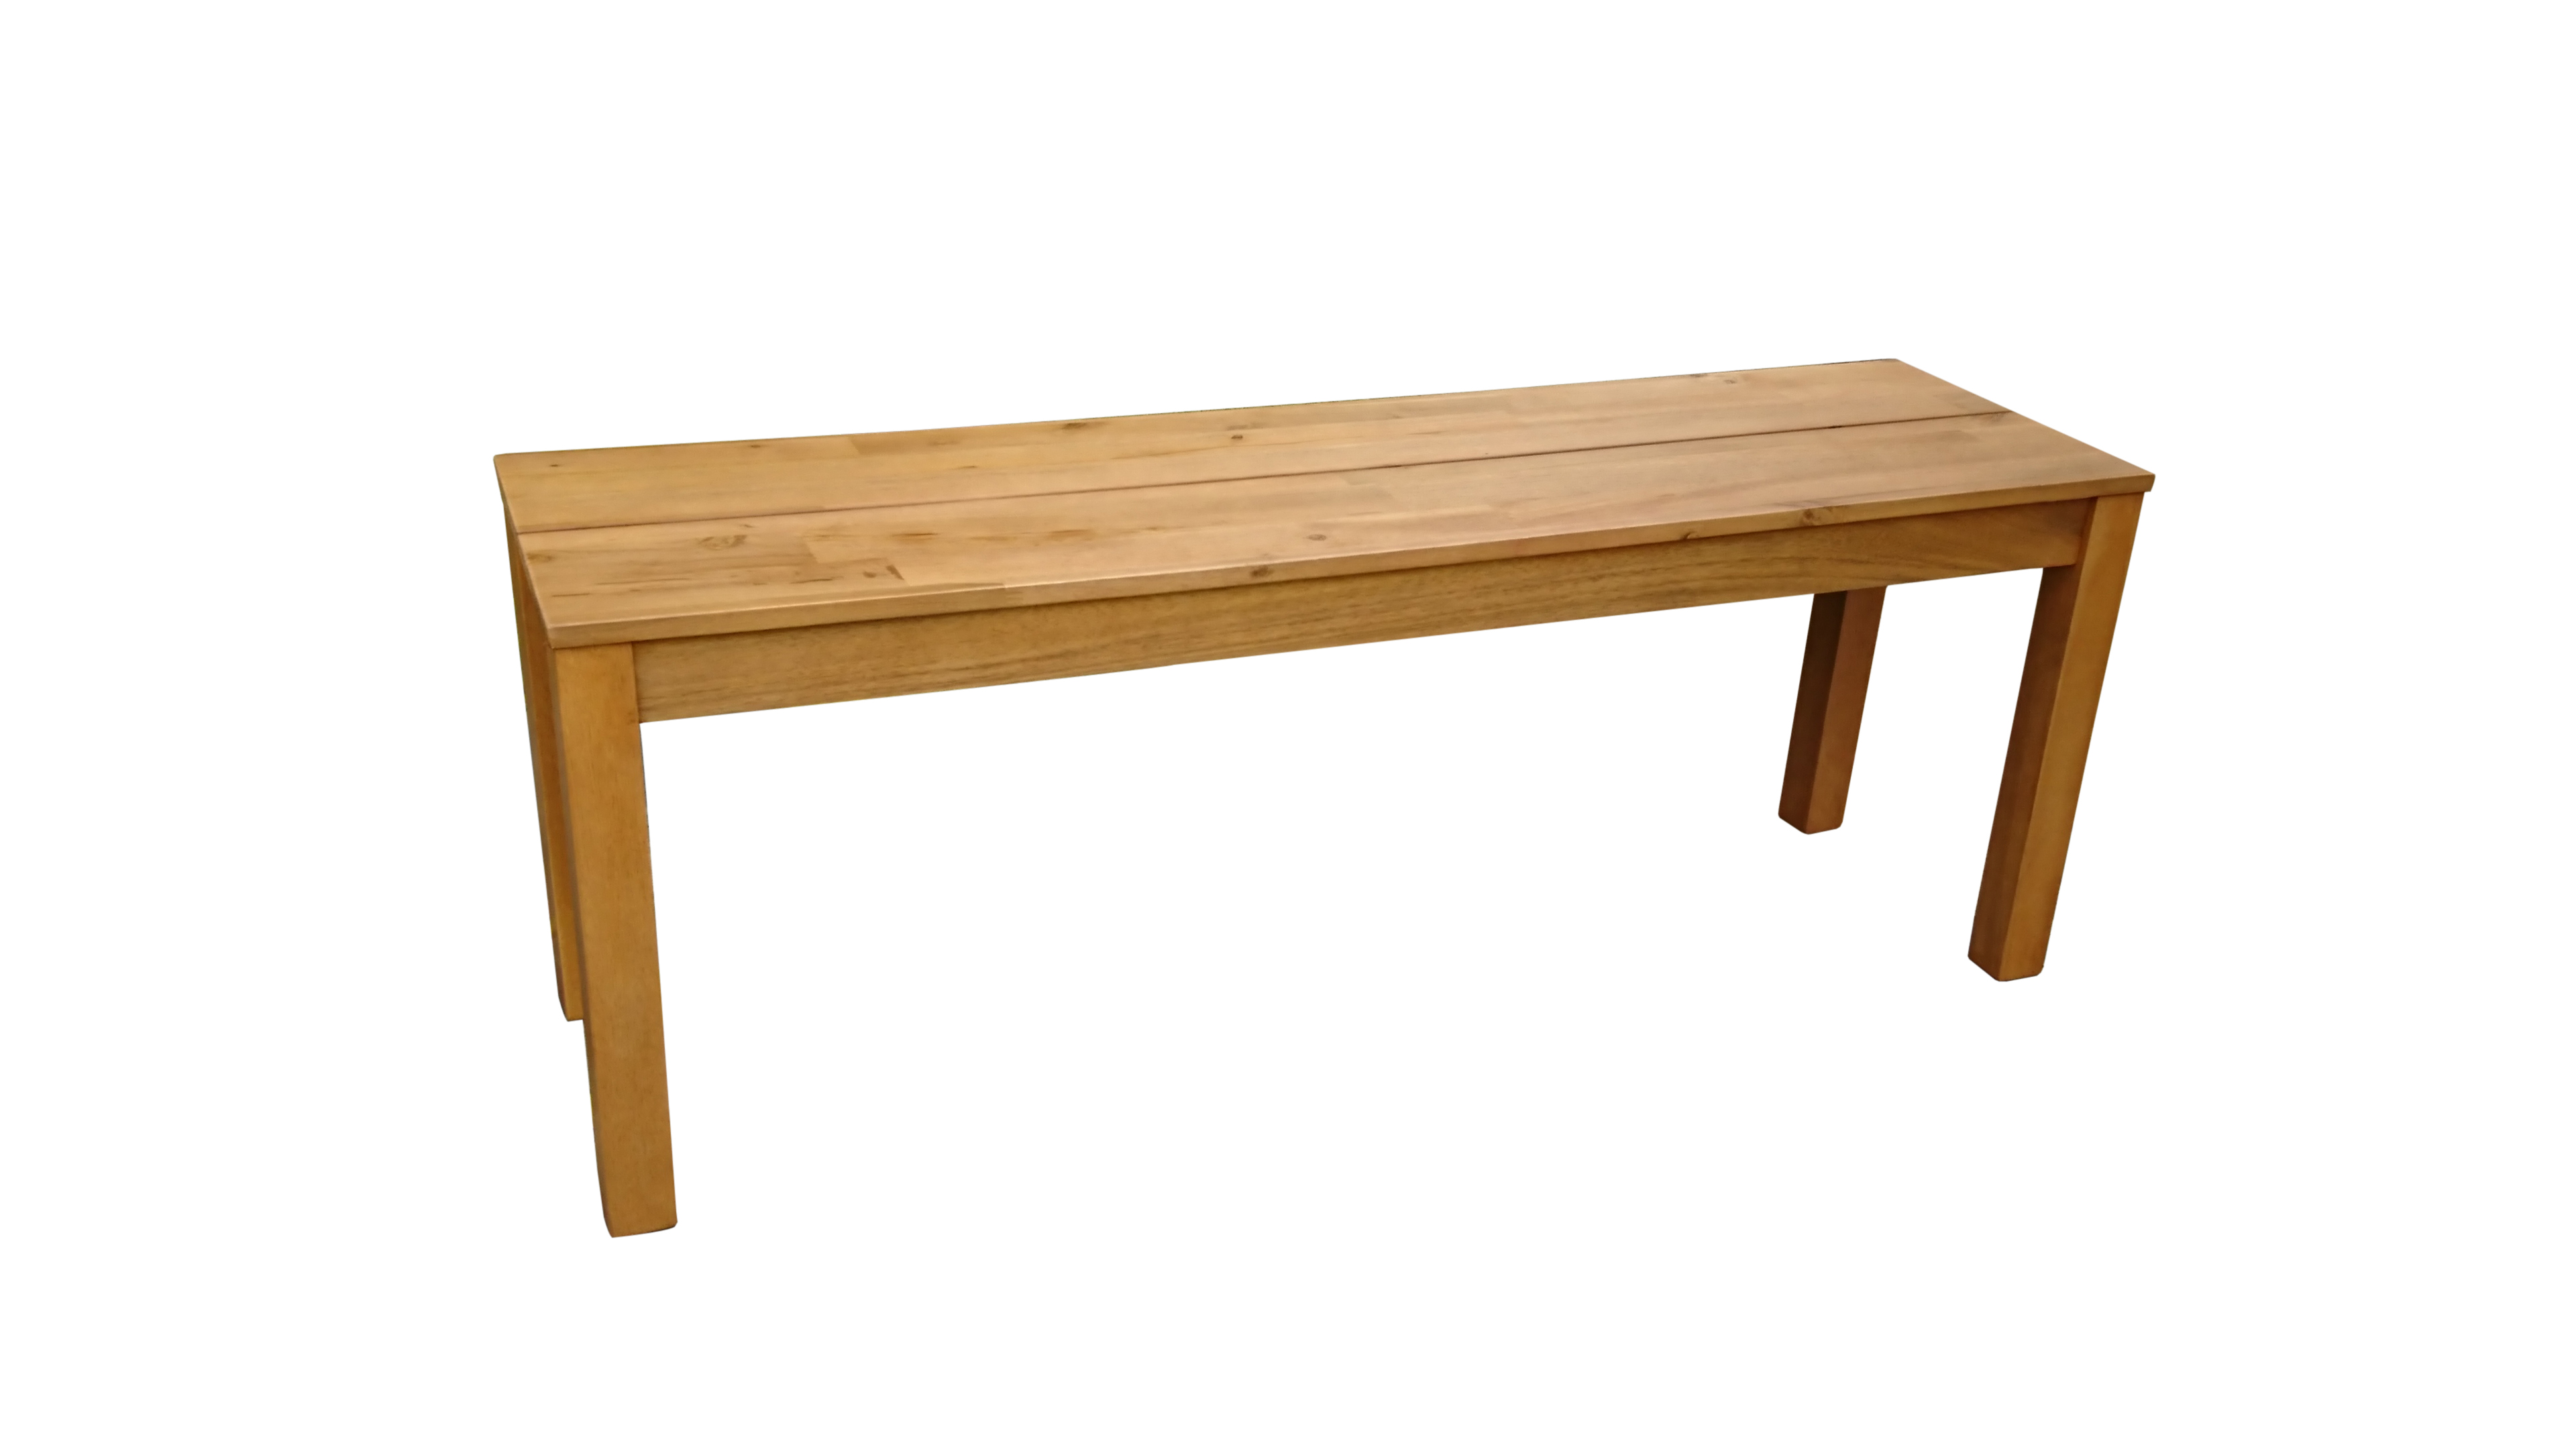 sam gartenbank sitzbank akazie 2 sitzer 120 cm elliott. Black Bedroom Furniture Sets. Home Design Ideas